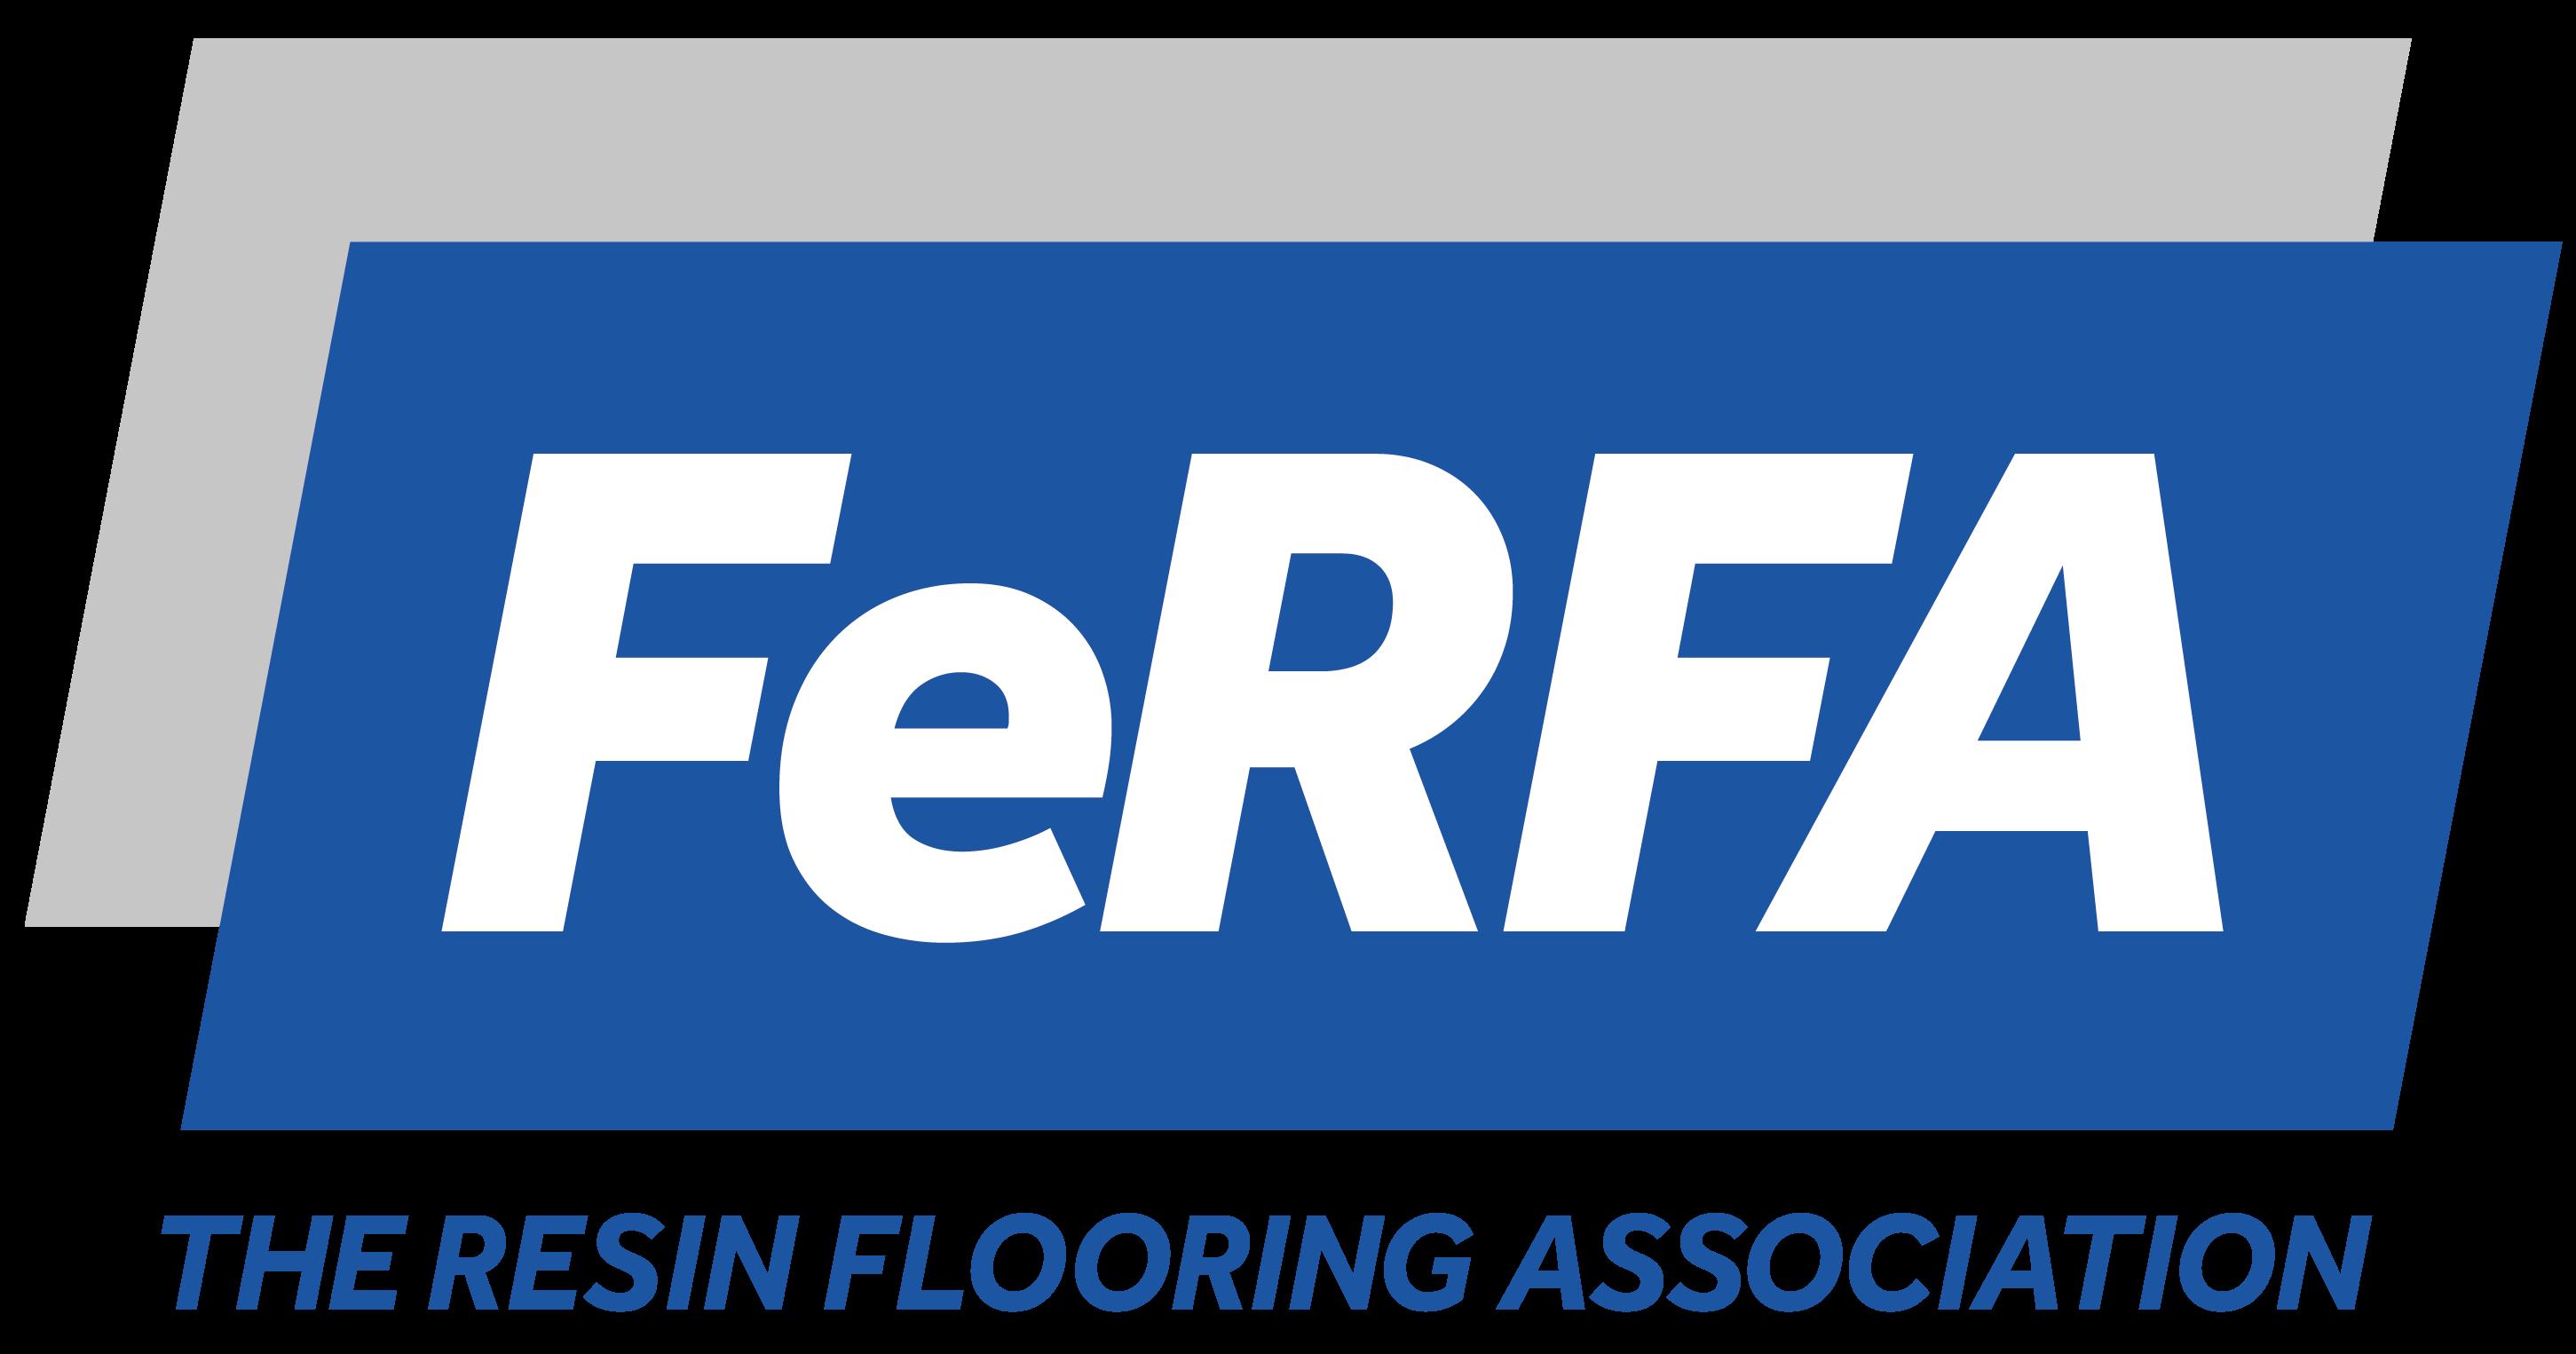 ferfa_logo-01-e1551964903510-opt